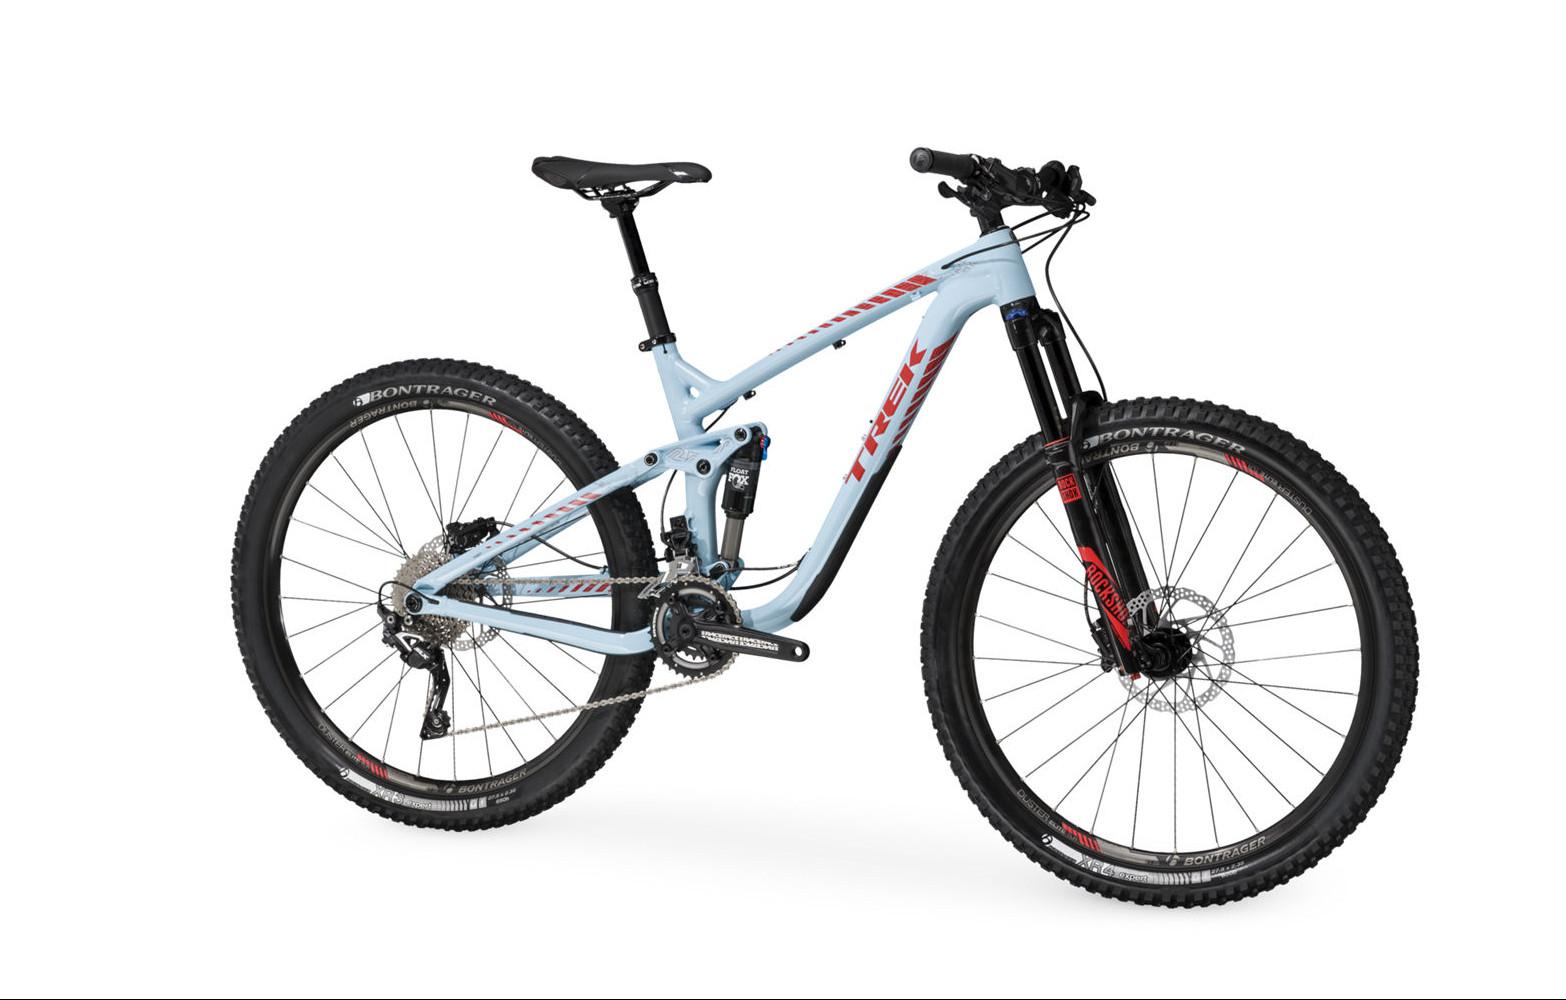 trek remedy 7 27 5 u0026 39  u0026 39  suspension bike